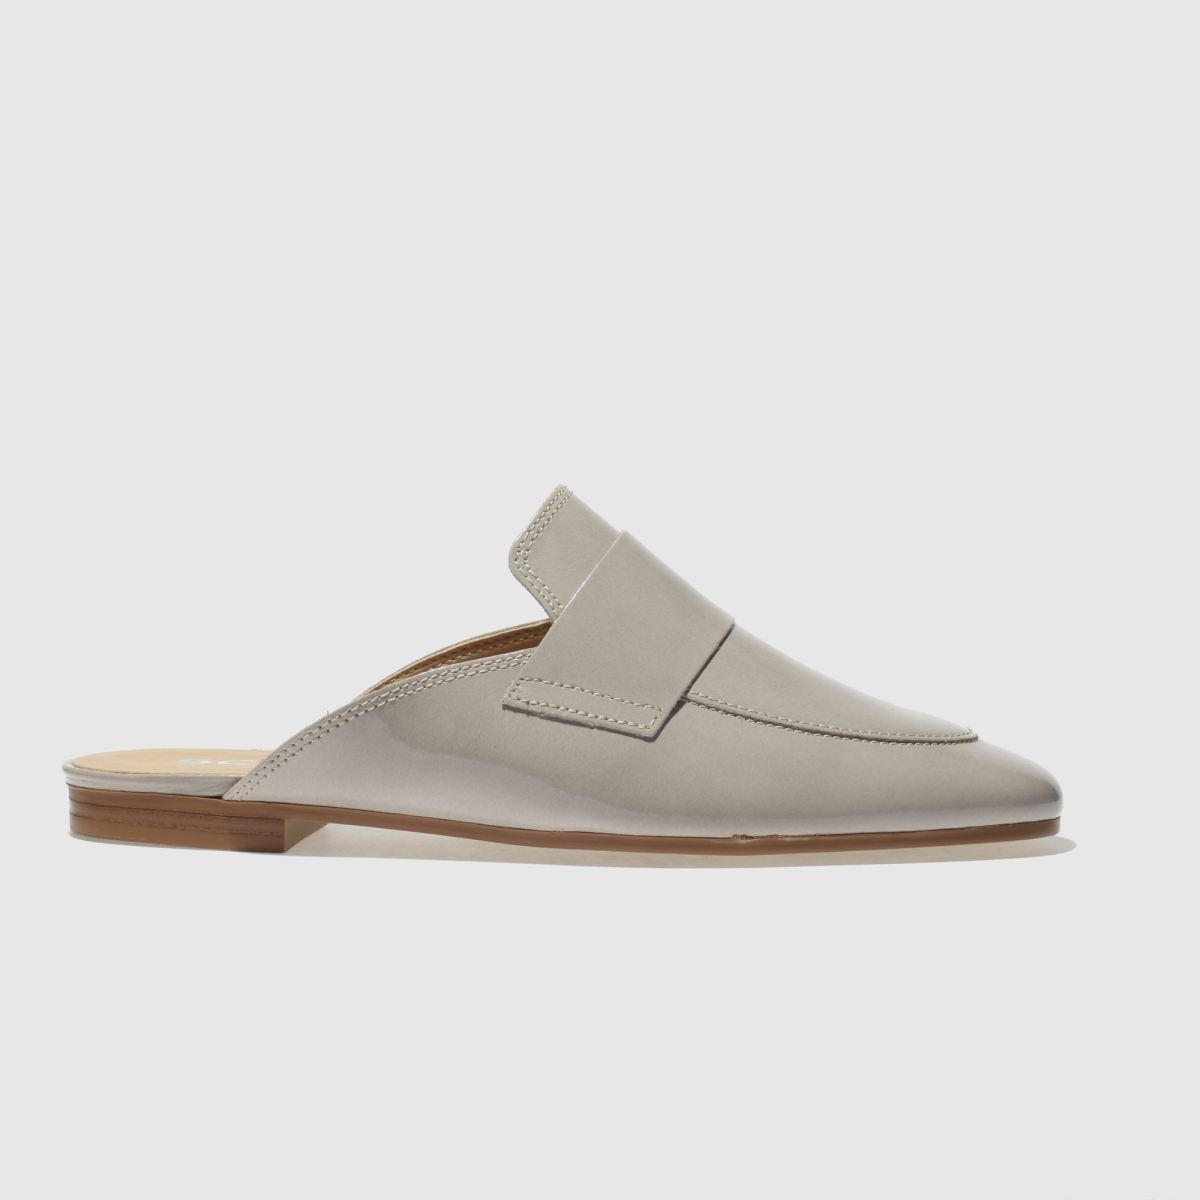 Schuh Light Grey Fancy Flat Shoes